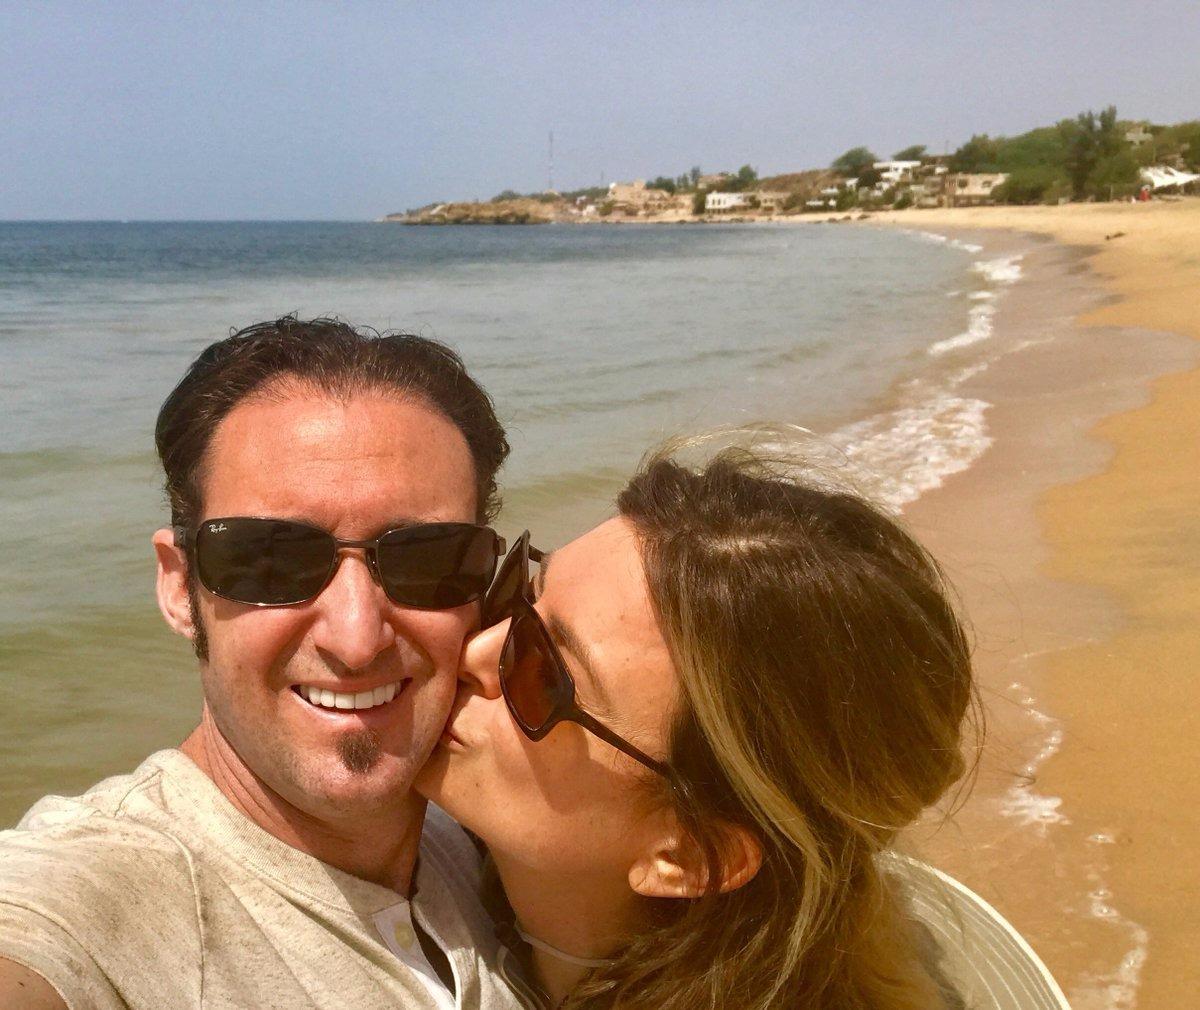 Lisa Bloom planting a kiss on her husband Braden Pollock's cheek